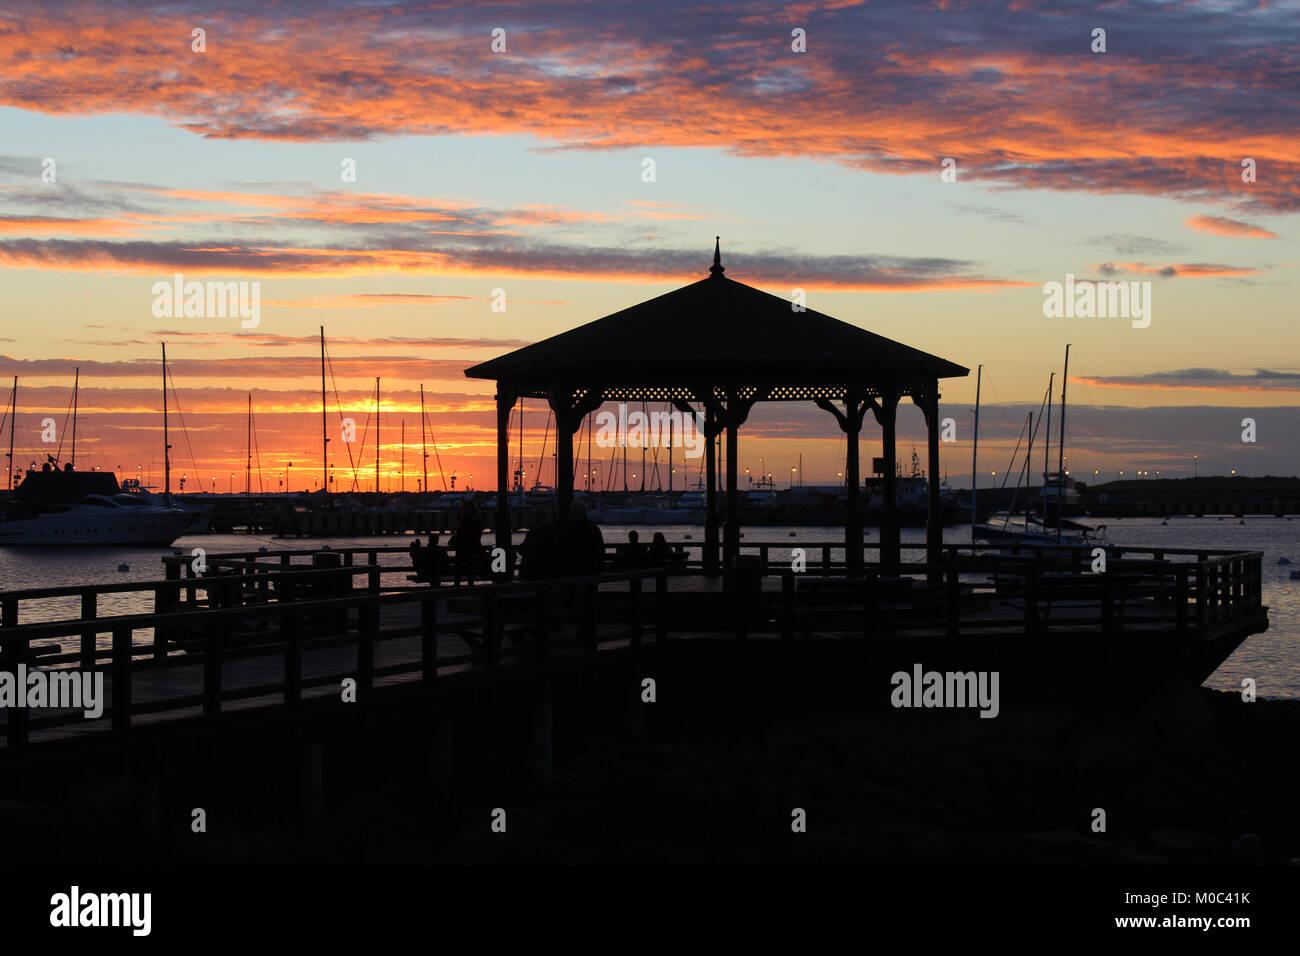 Lovely sunset at Punta del Este, Uruguay. - Stock Image